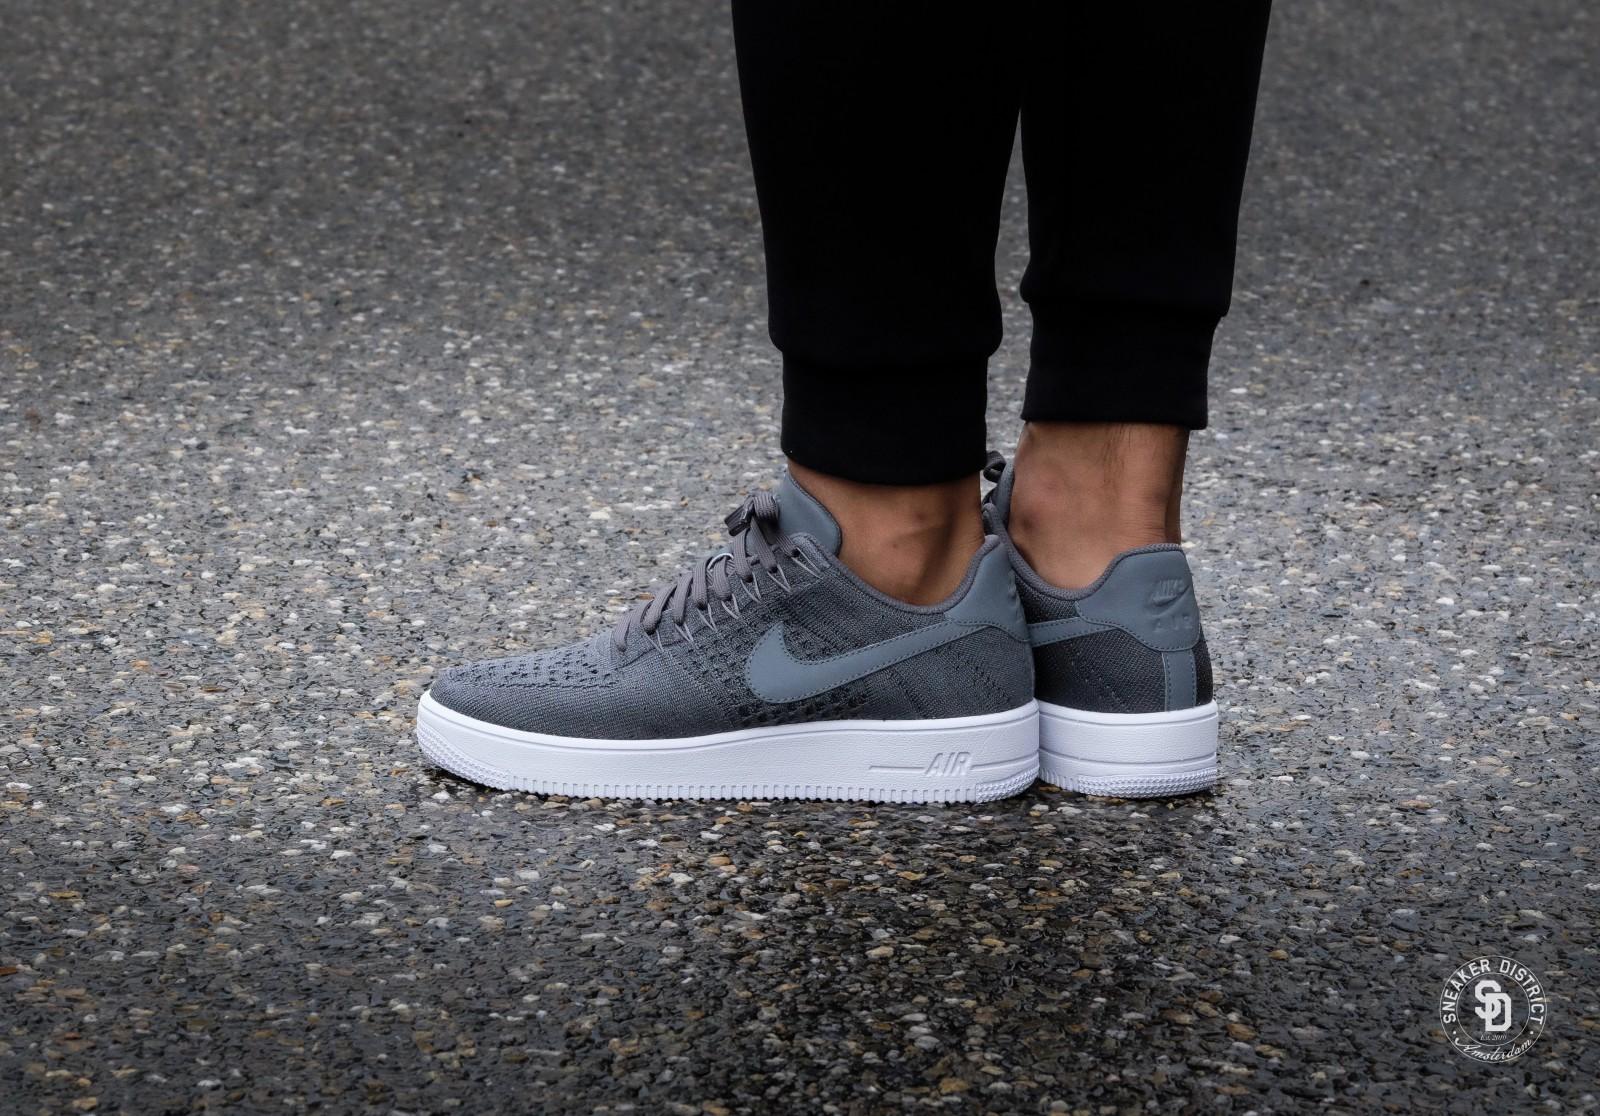 Nike Air Force 1 Ultra Flyknit Low Dark Grey/White